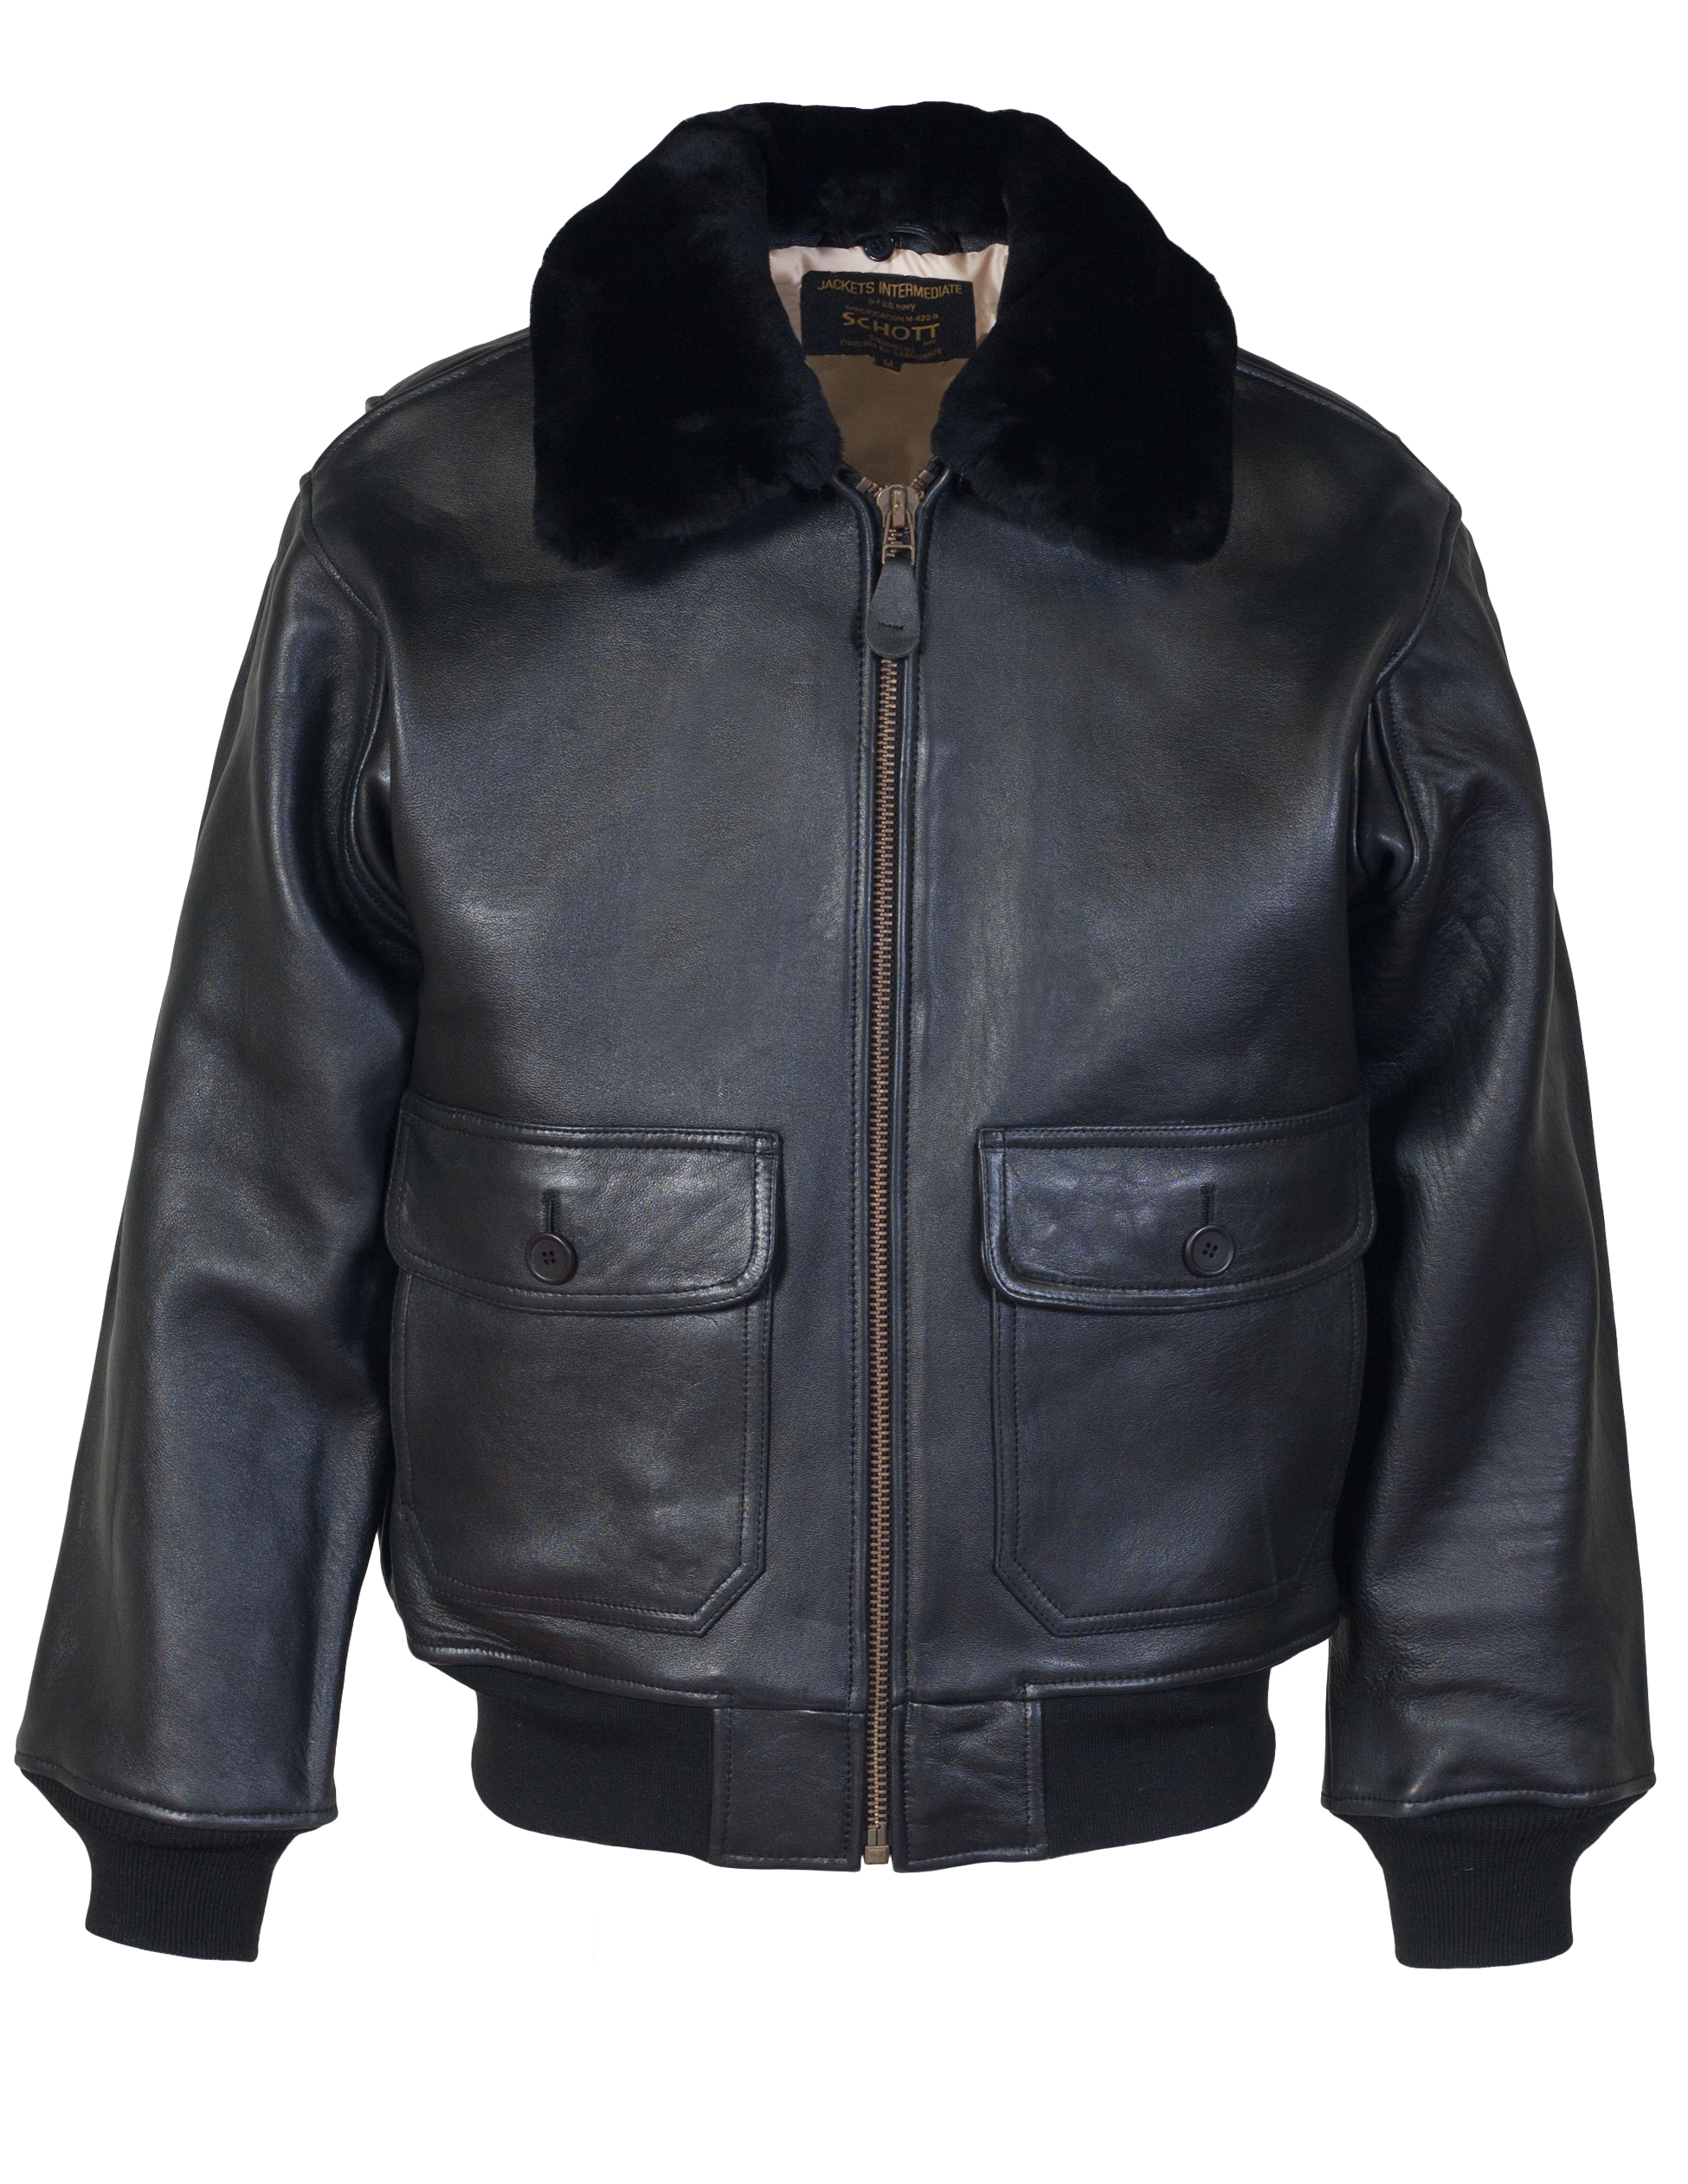 Schott N.Y.C. G1S G-1 Leather Flight Jacket